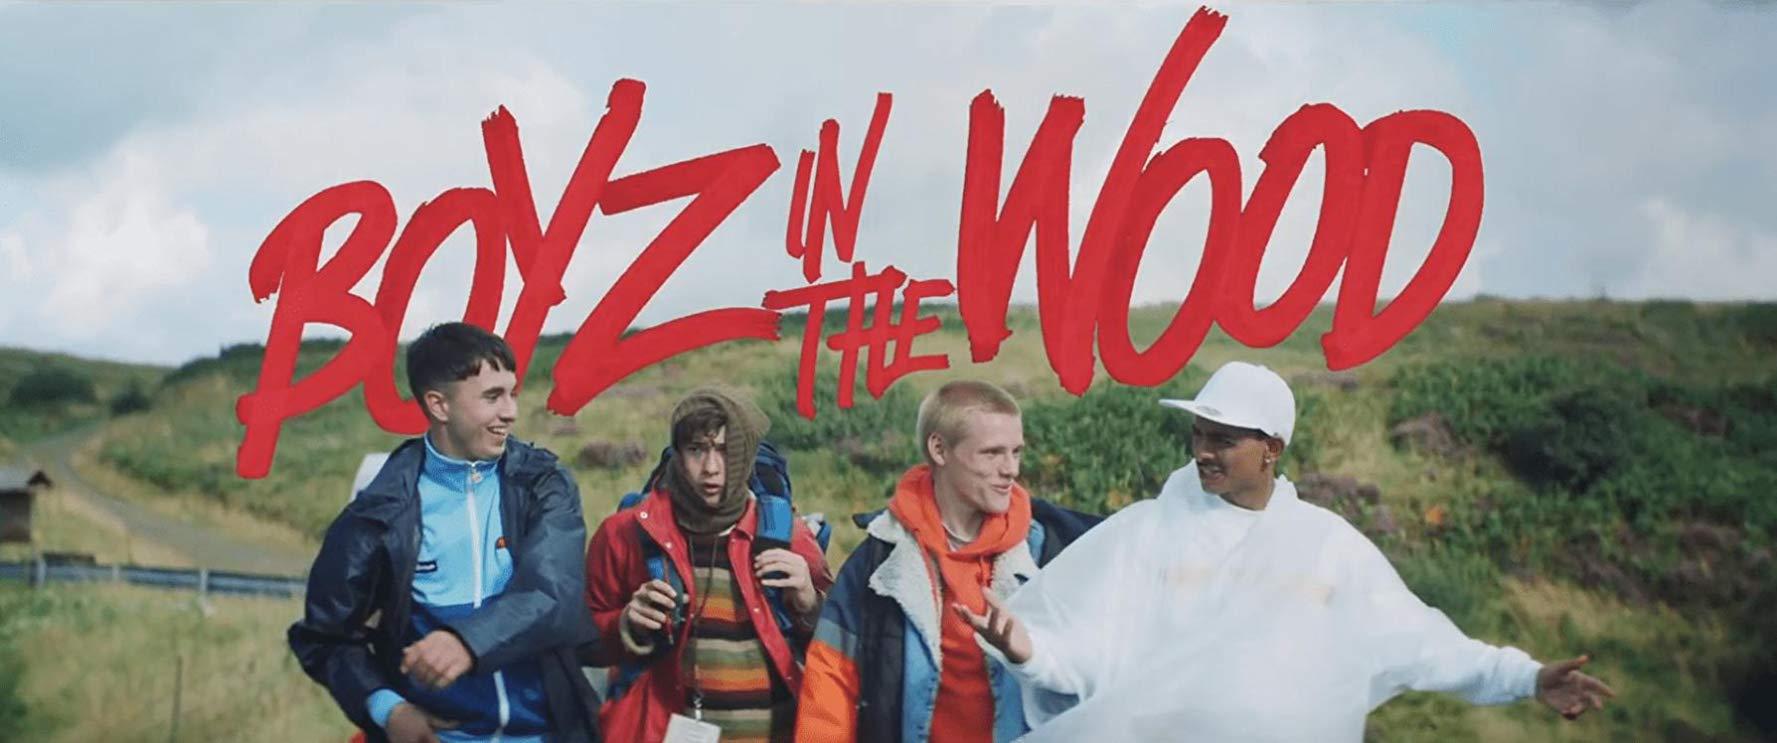 Boyz in the Wood (2019) Online Subtitrat in Romana